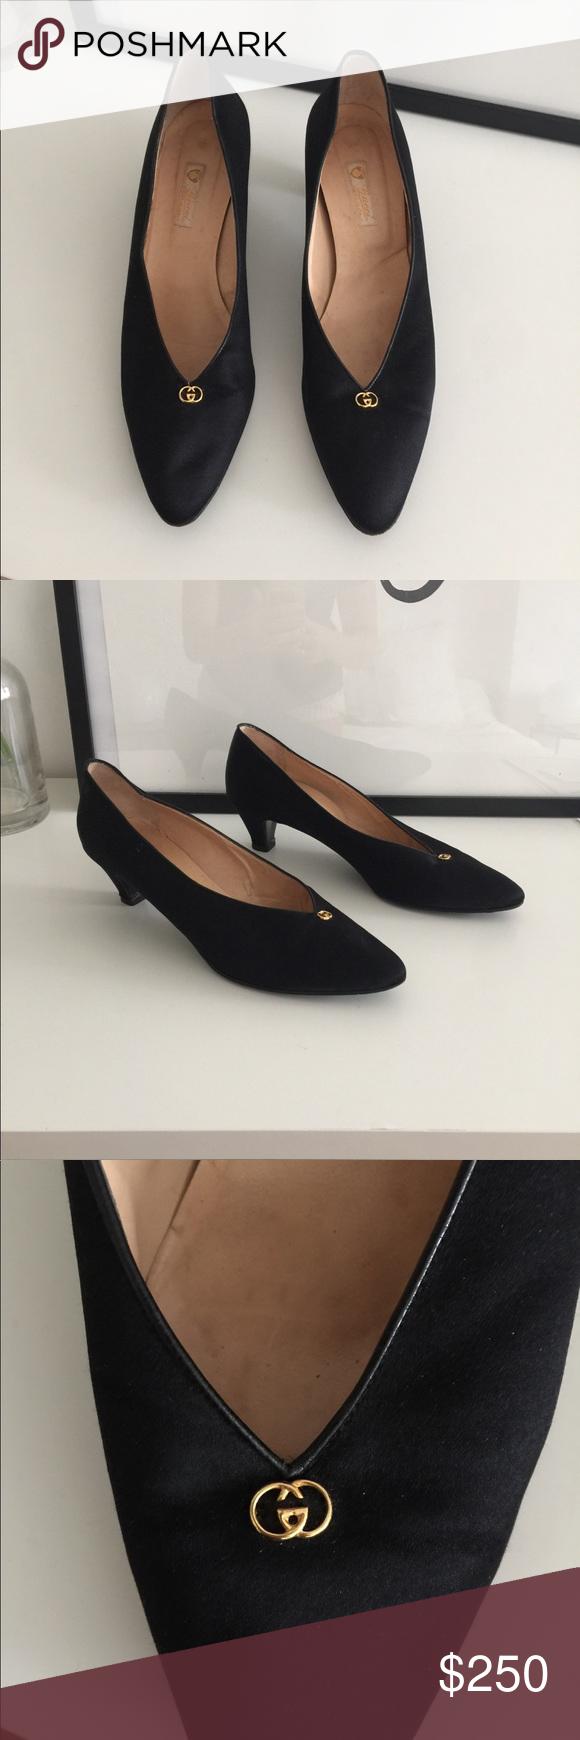 feb6a1a78d0 Vintage Gucci Black Kitten Heel Womens Shoes - Vintage - Black - Authentic  Gucci - Size 40 Euro - Kitten Heel - Pointy Shoe Style Gucci Shoes Heels